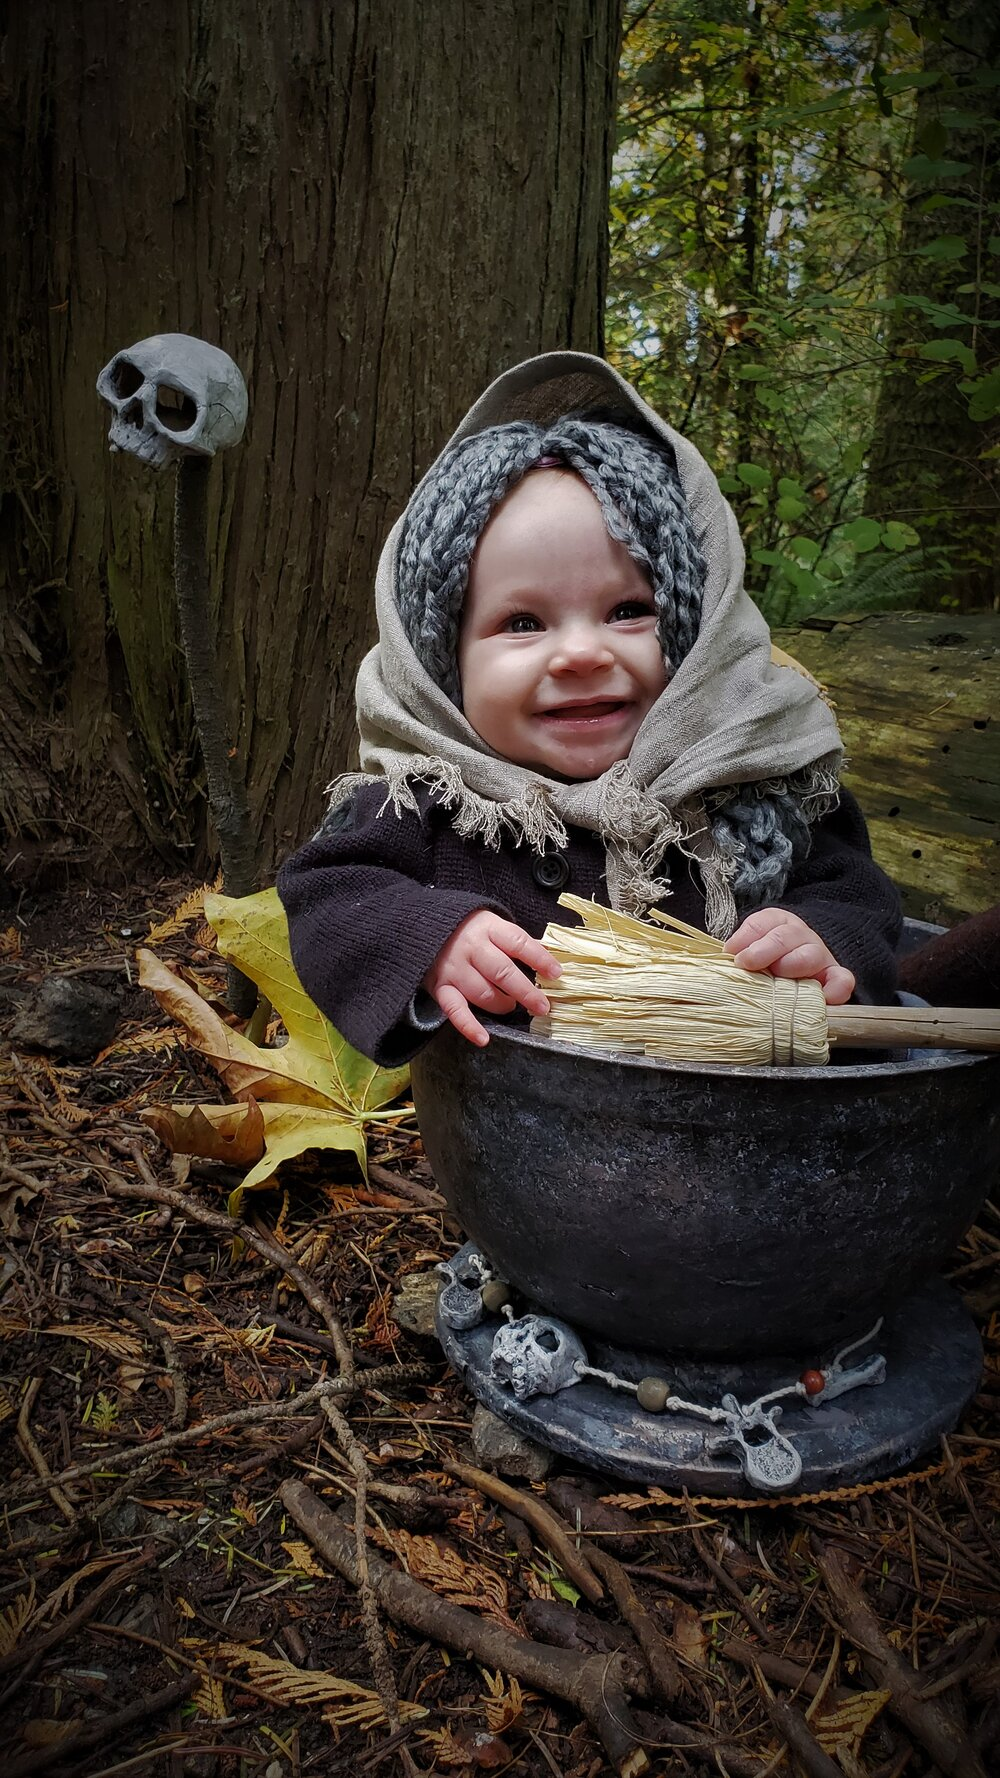 Baby Baba Yaga in mortar happy smiling